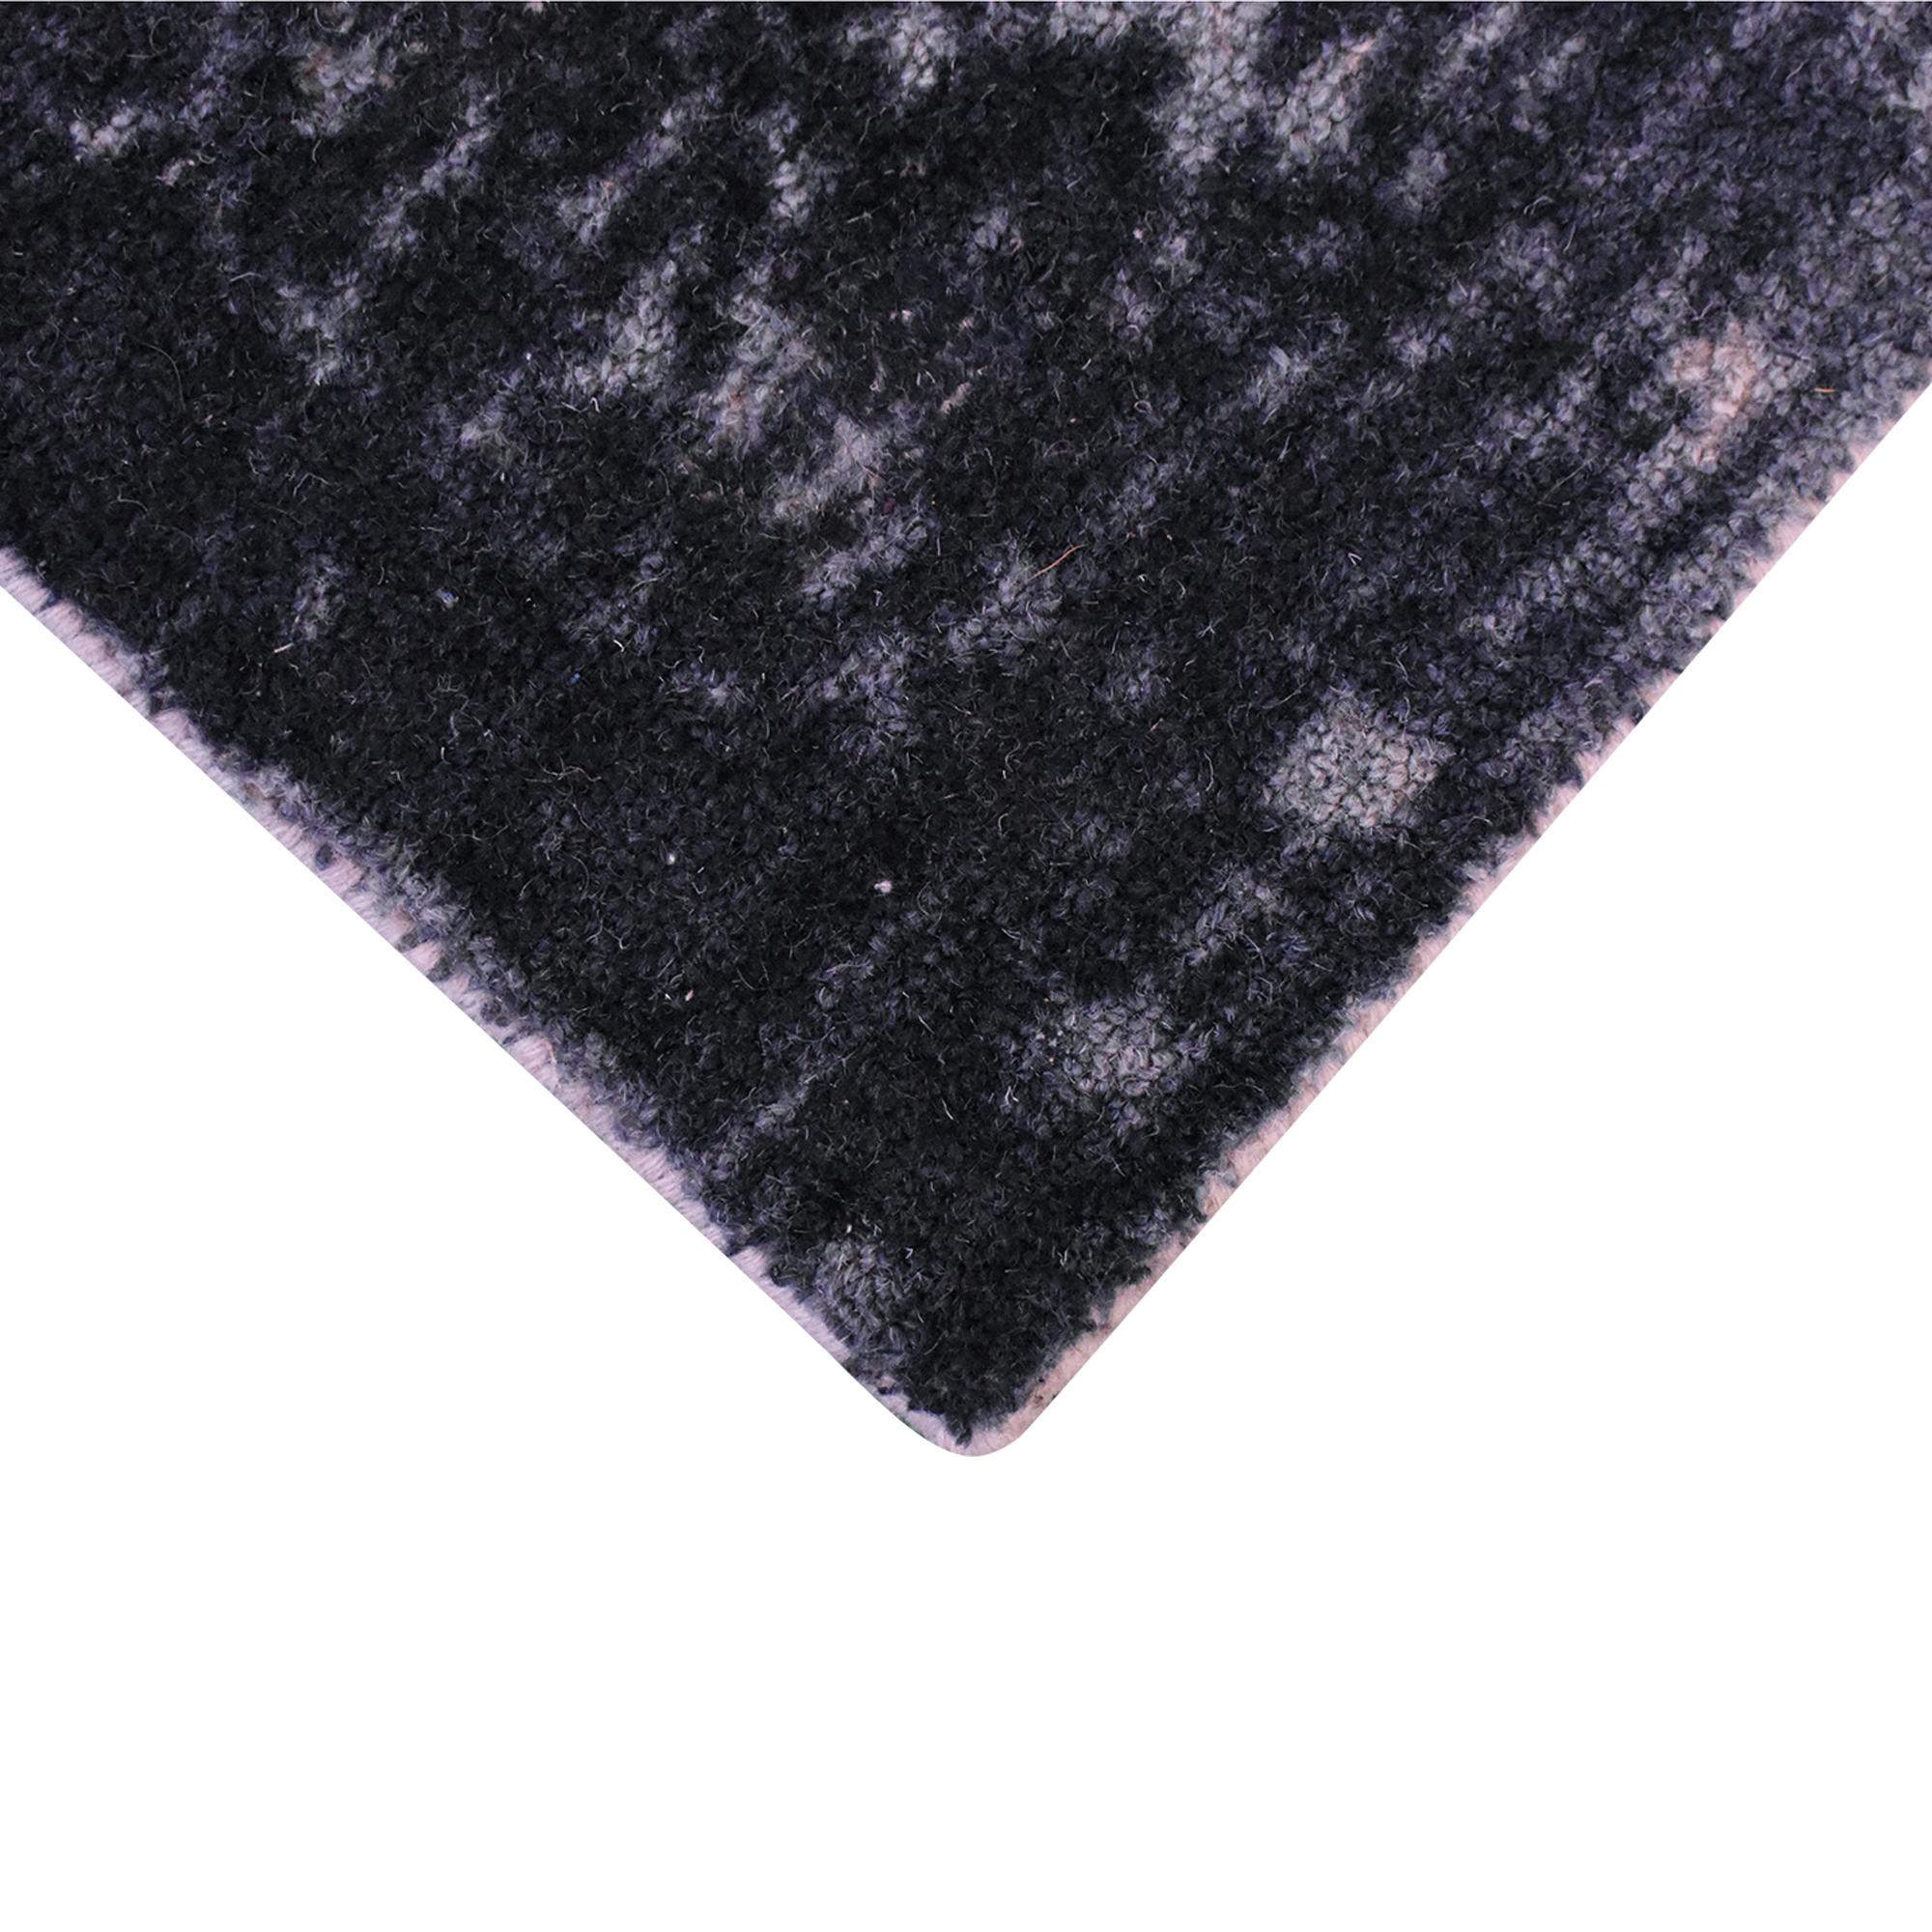 West Elm West Elm Distressed Arabesque Wool Rug